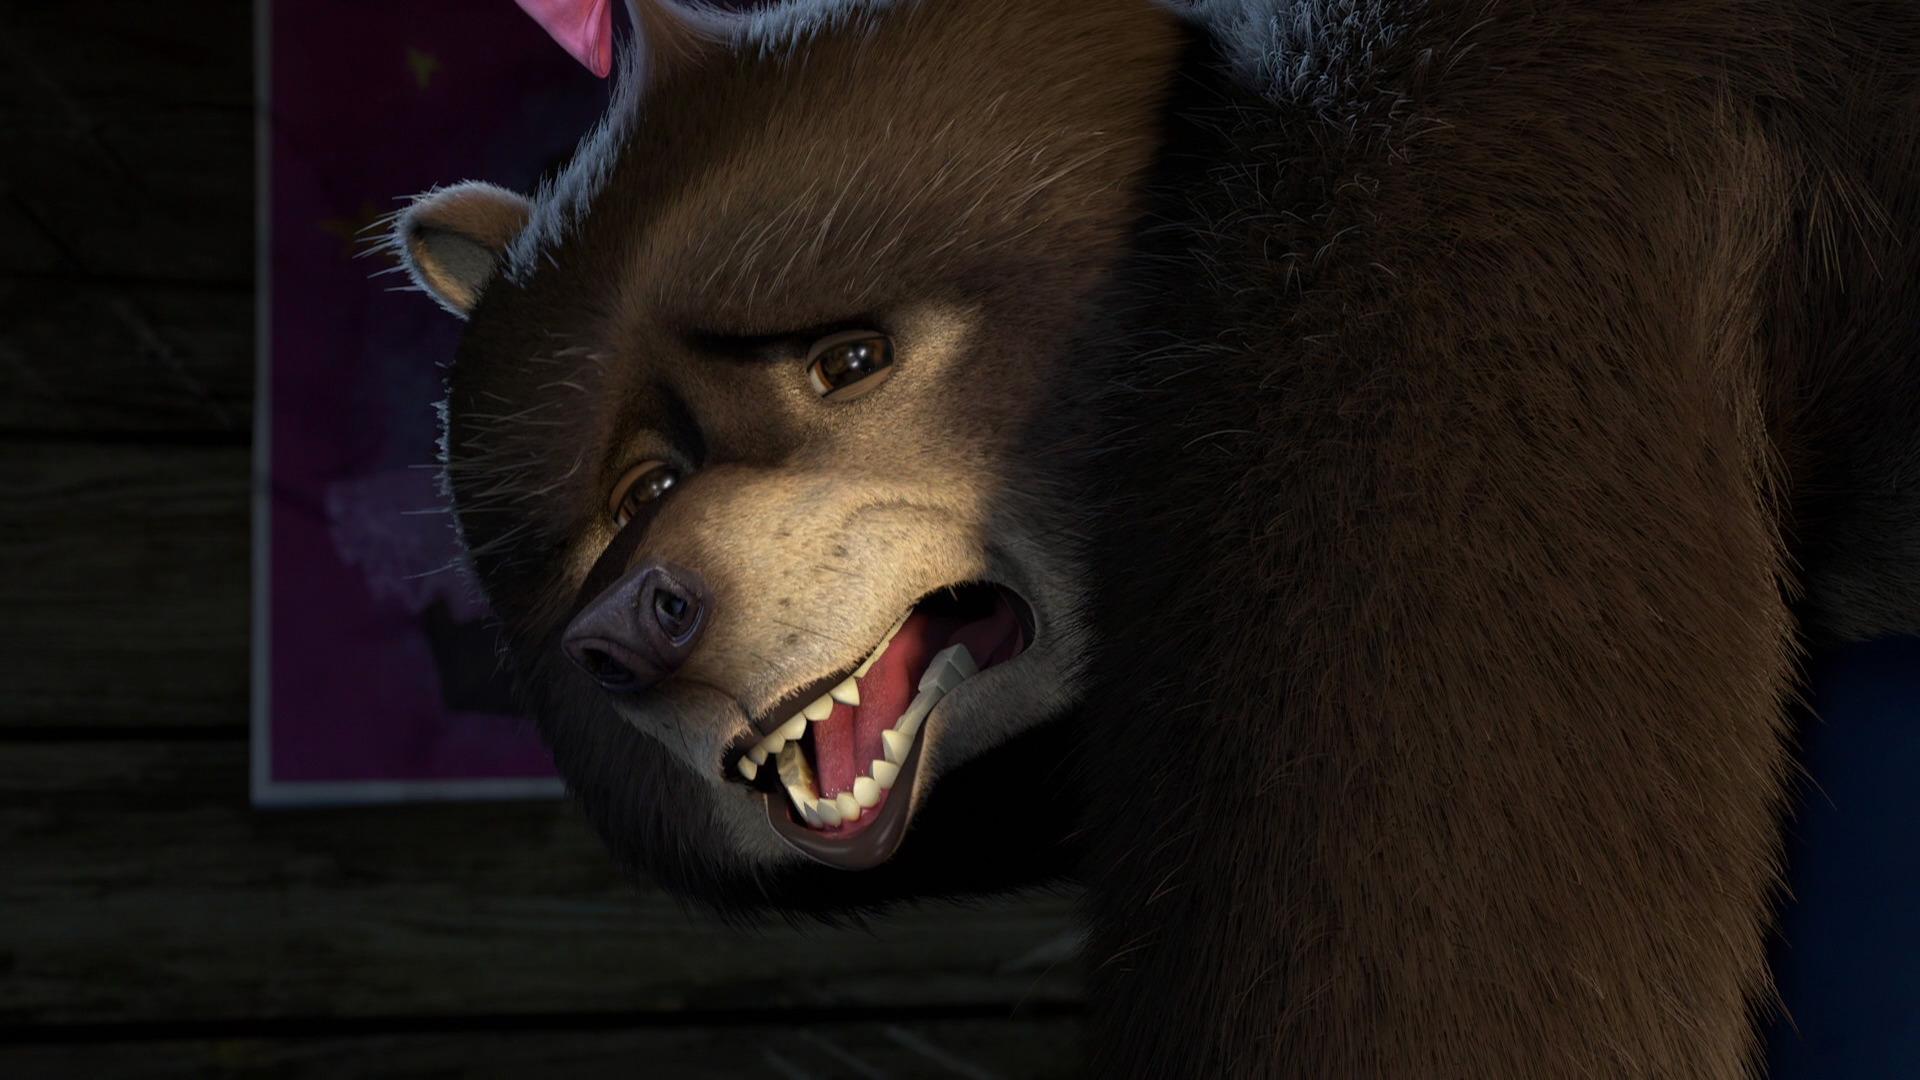 Sonya the Bear by cmara on DeviantArt